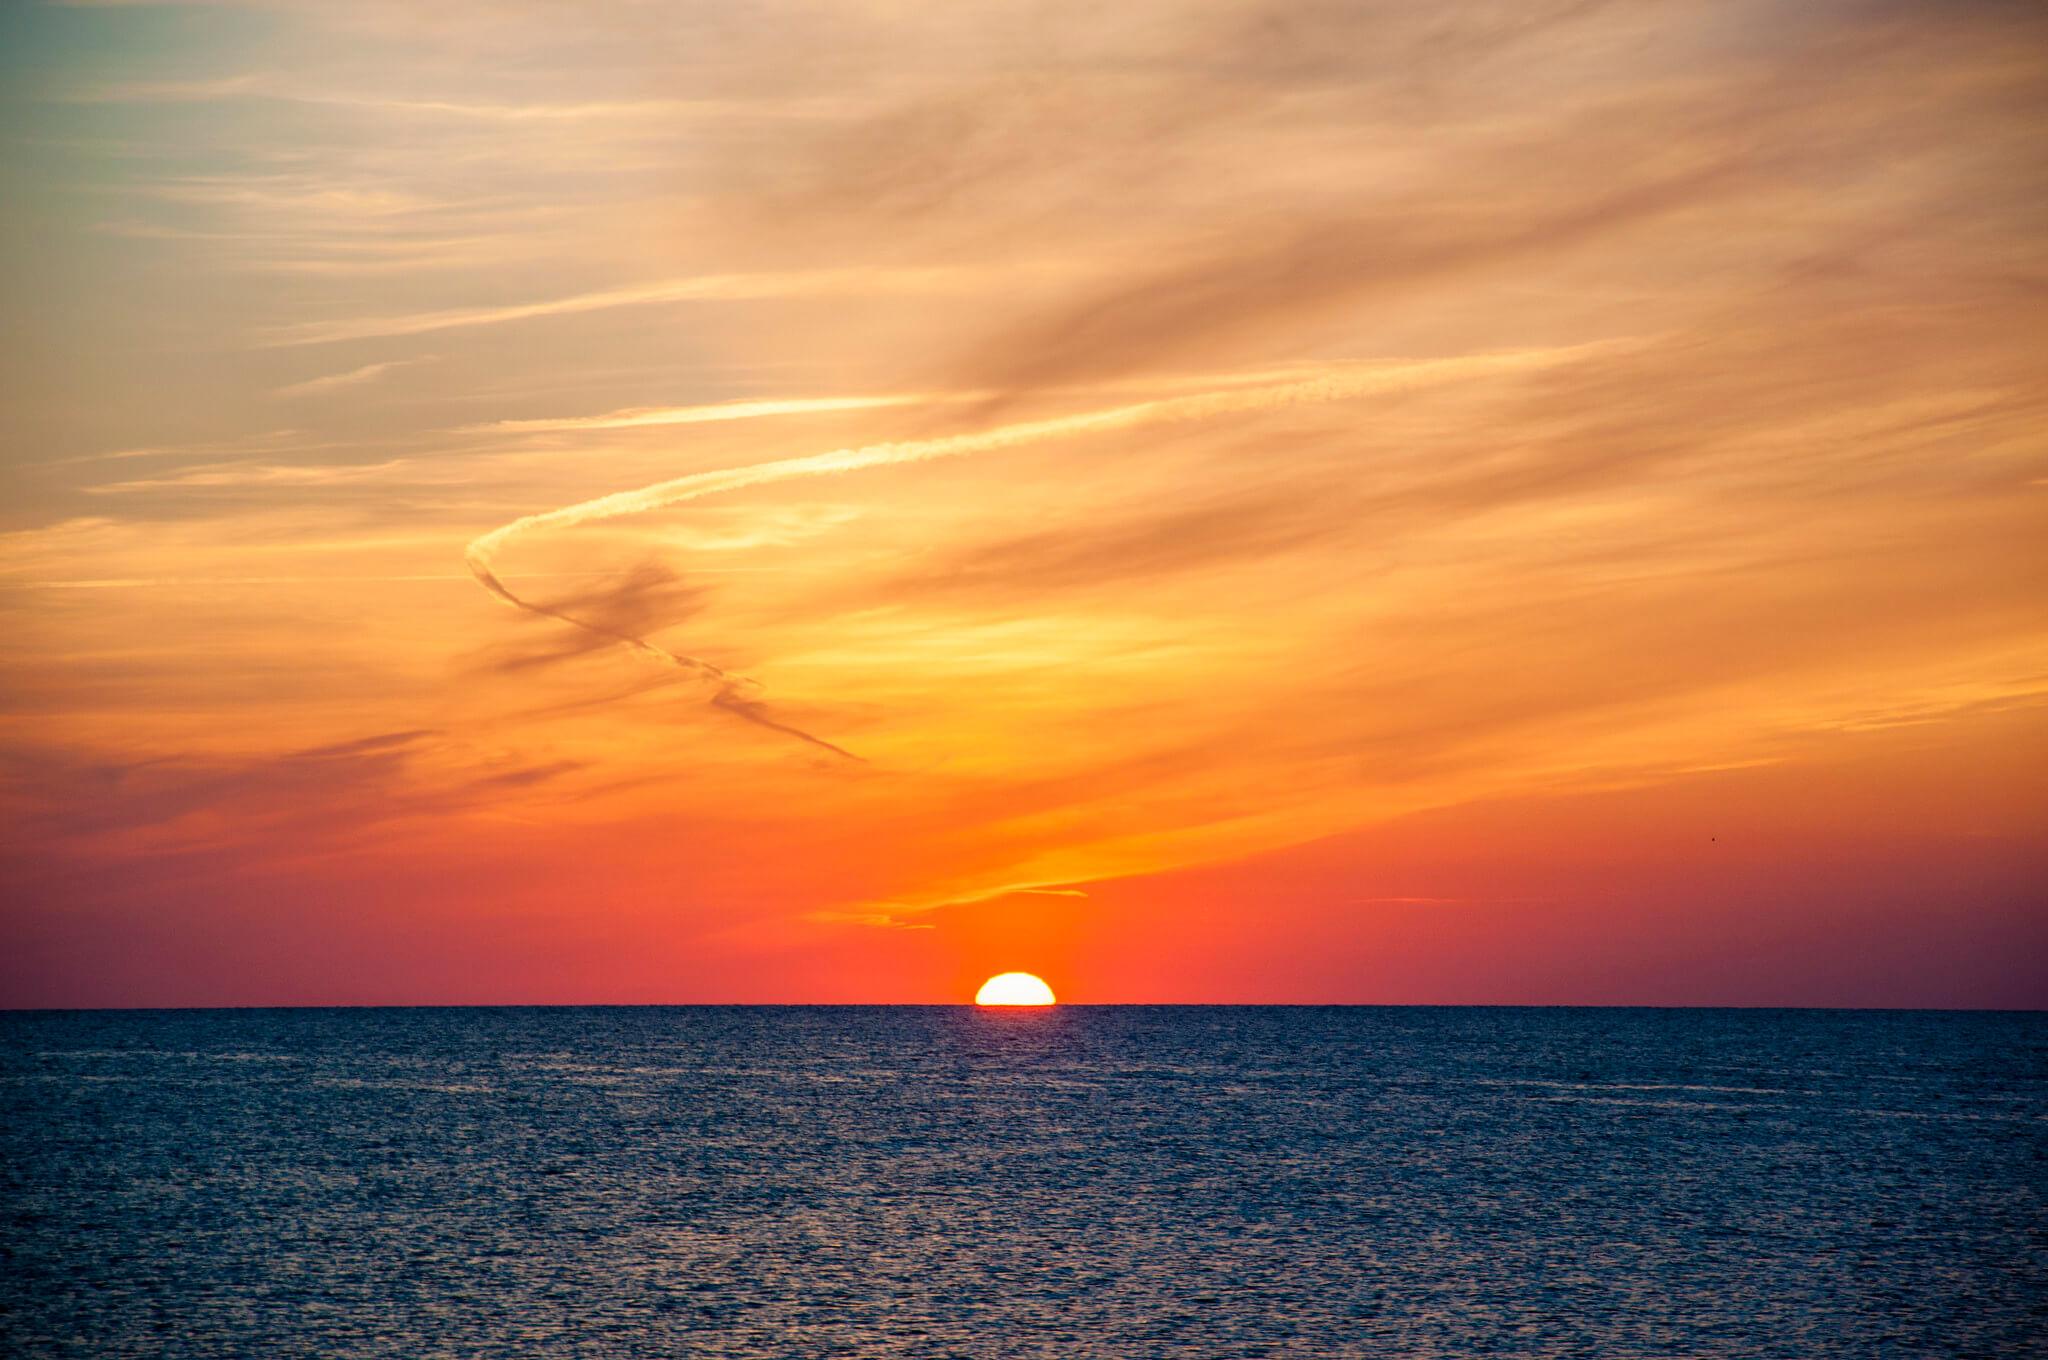 https://www.white-ibiza.com/wp-content/uploads/2020/03/formentera-sunsets-2020-04.jpg